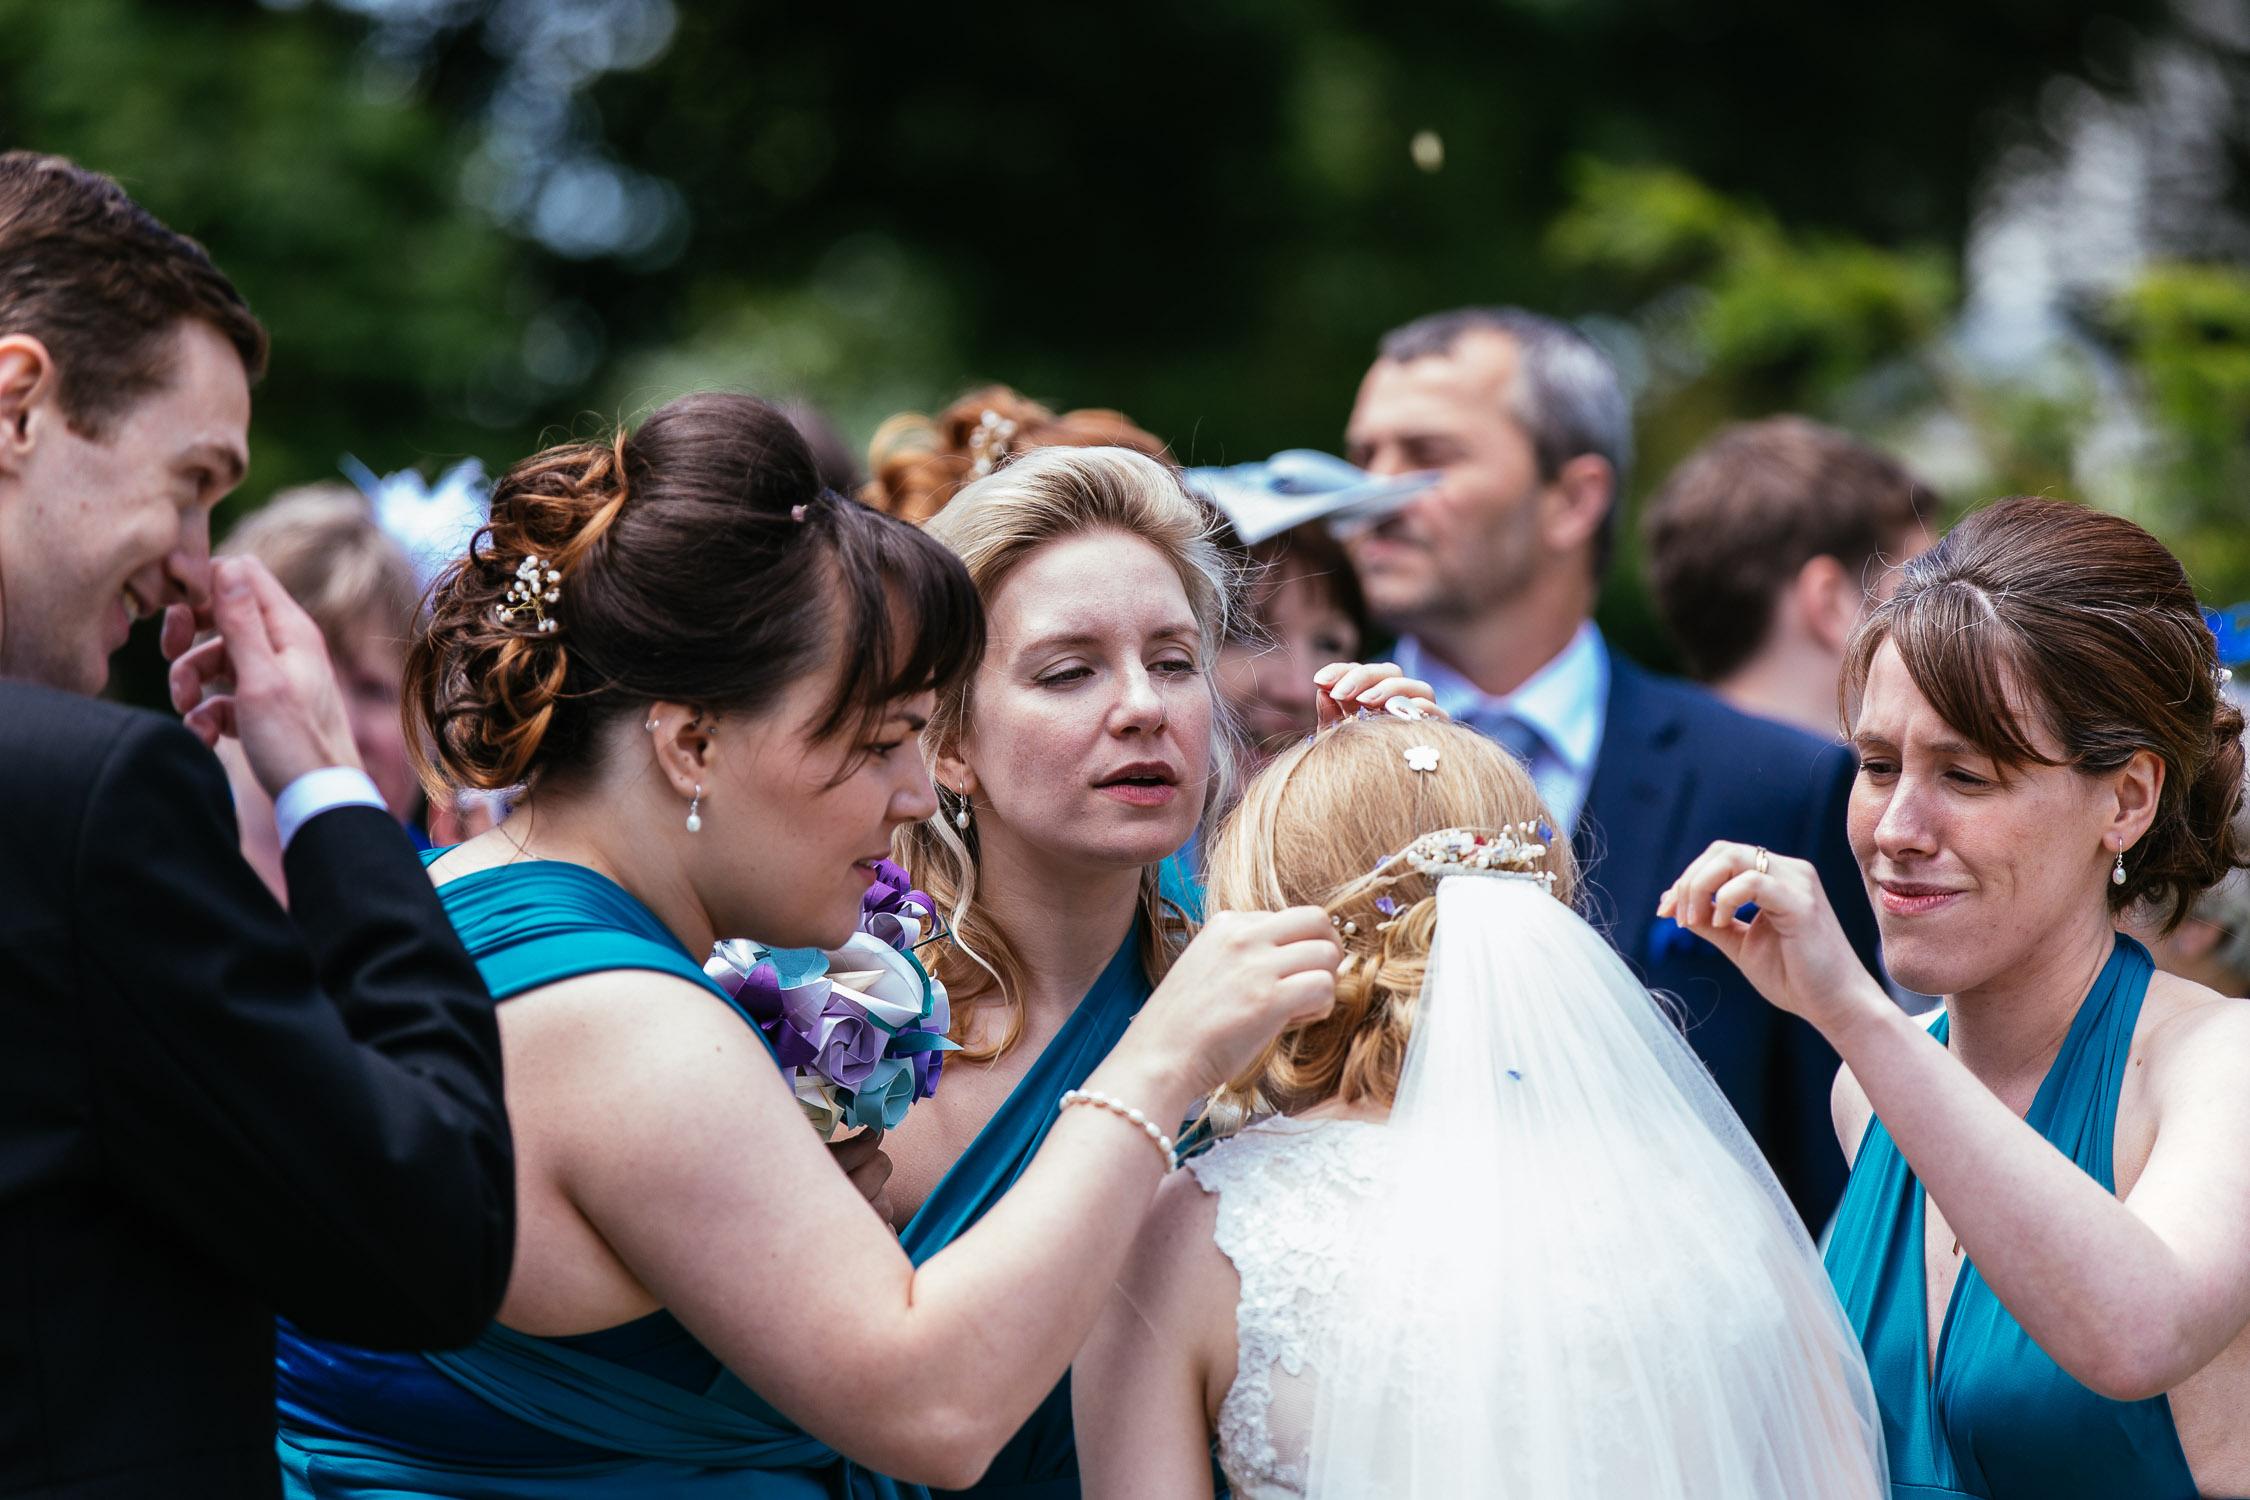 Lizi-and-Mark-Wedding-Highlights-40.jpg